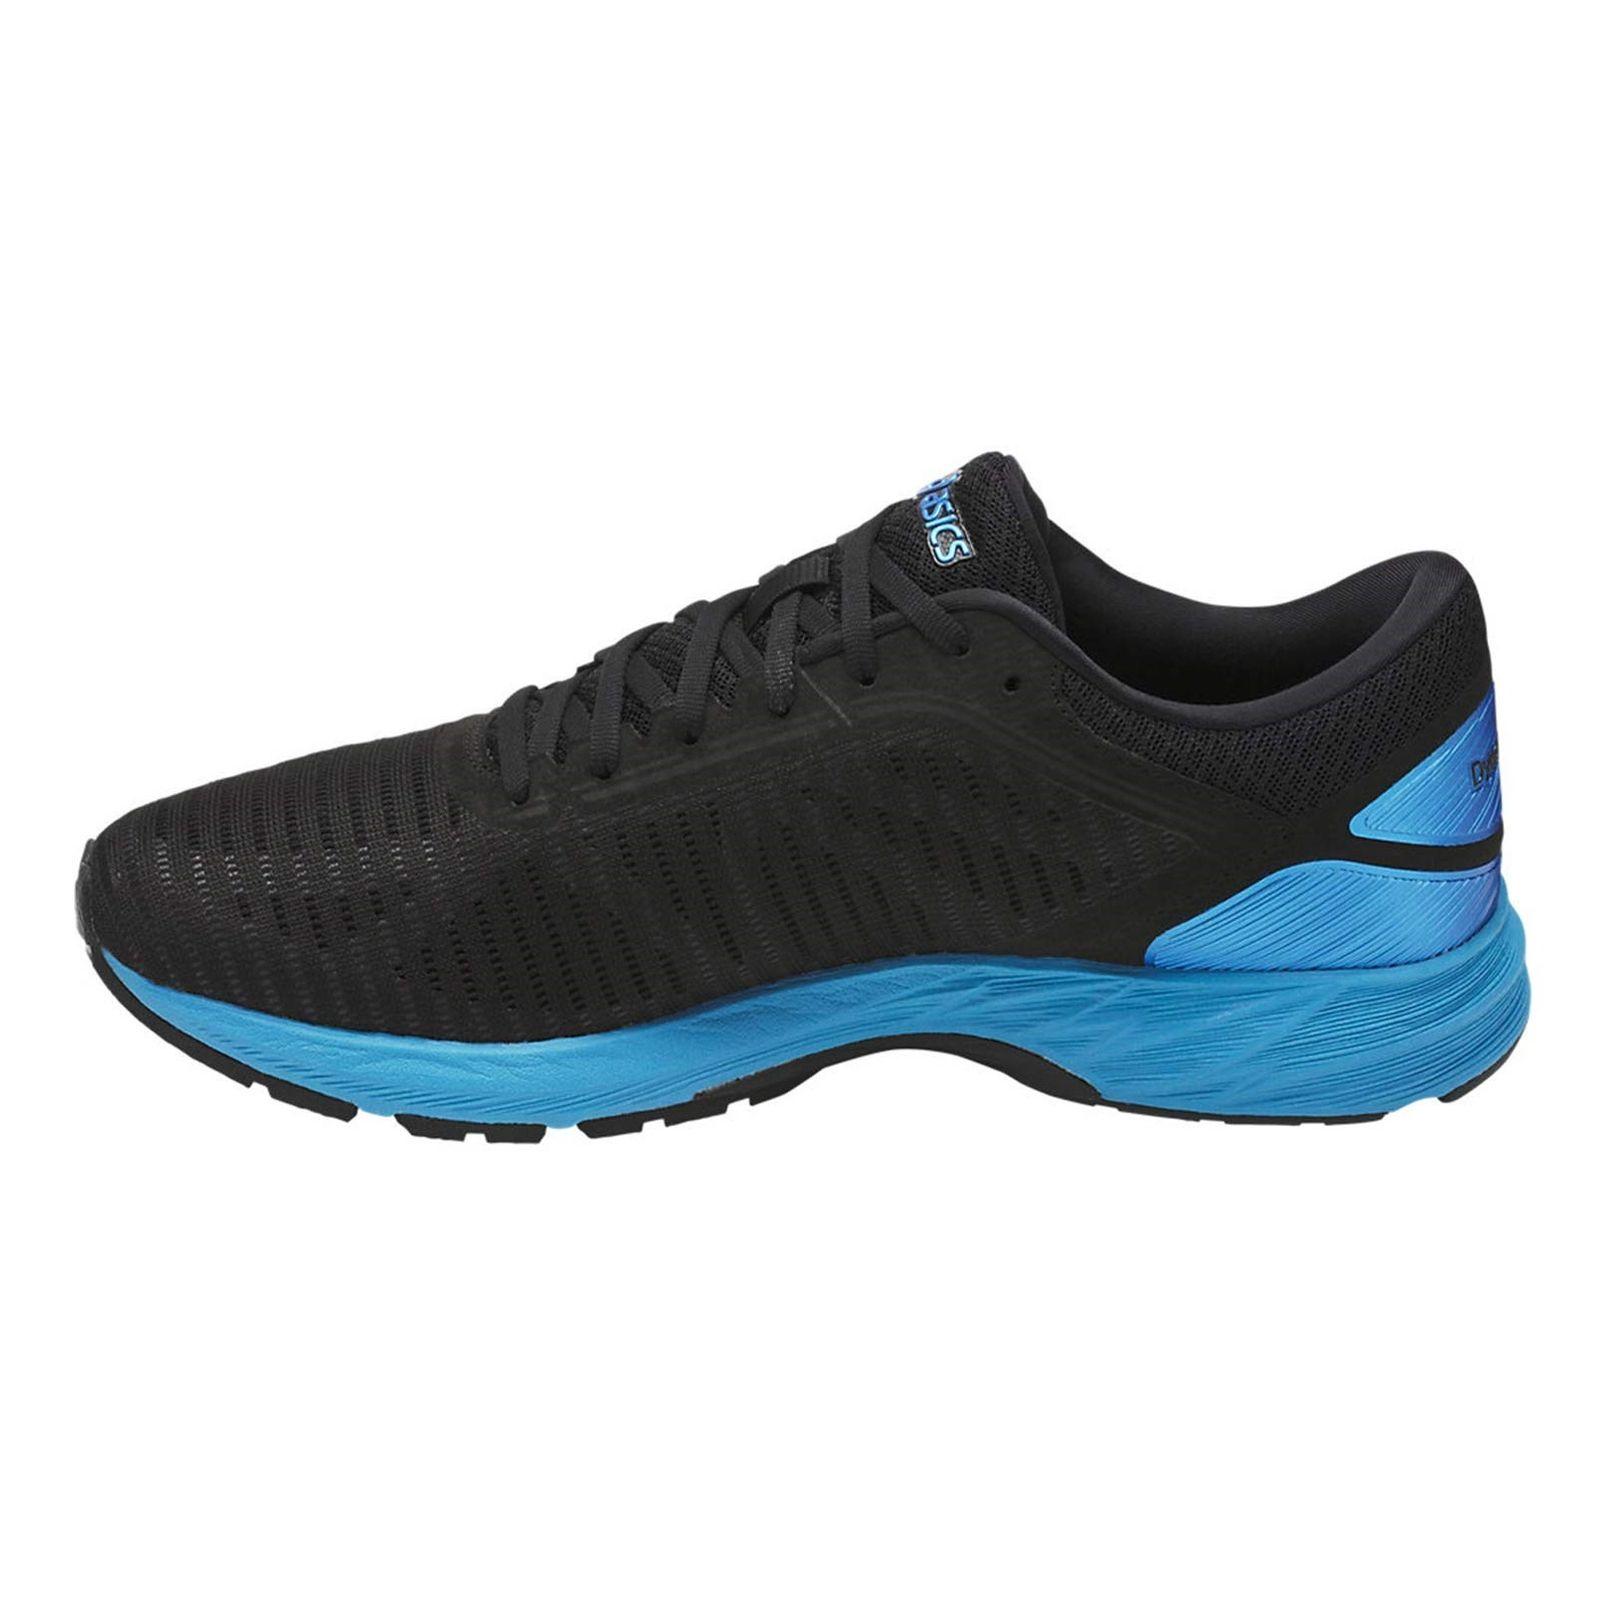 کفش دویدن بندی مردانه DynaFlyte 2 - اسیکس - مشکی - 6